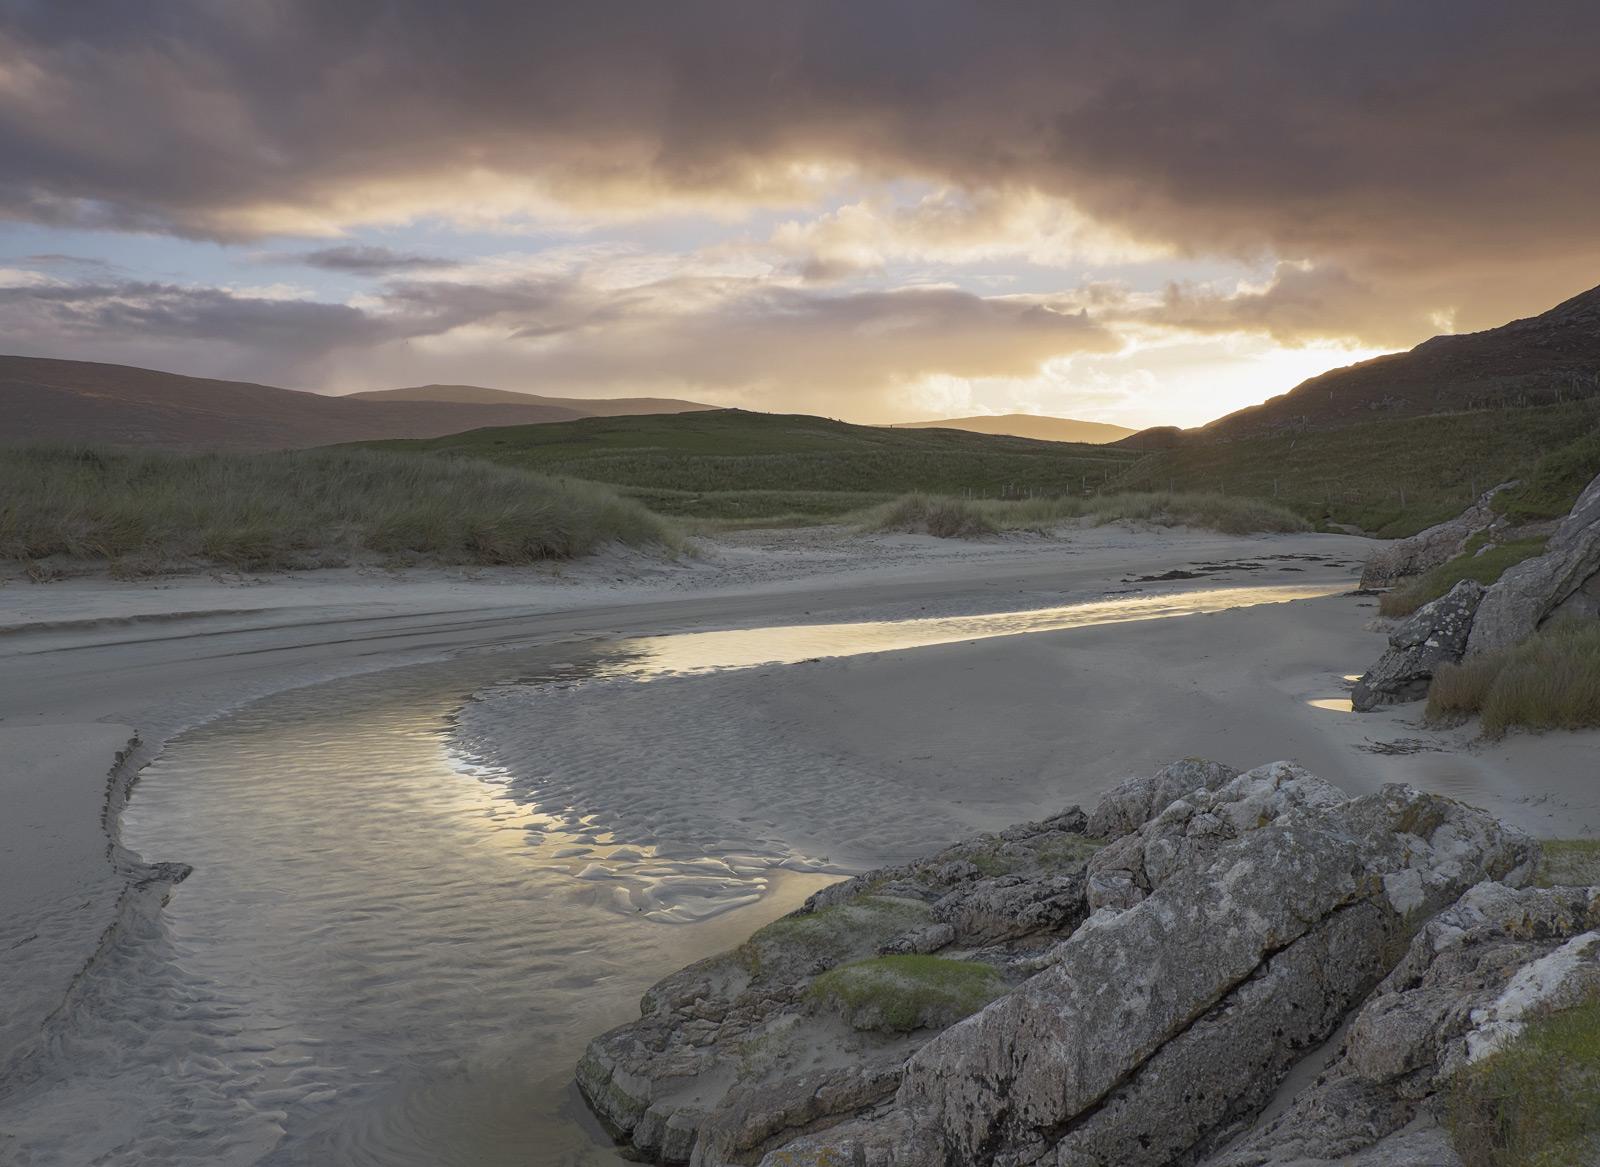 Seilebost Stream Sunrise, Seilebost, Harris, Scotland, stream, meanders, sea, filters, rippled, dune, beach, reflected, , photo